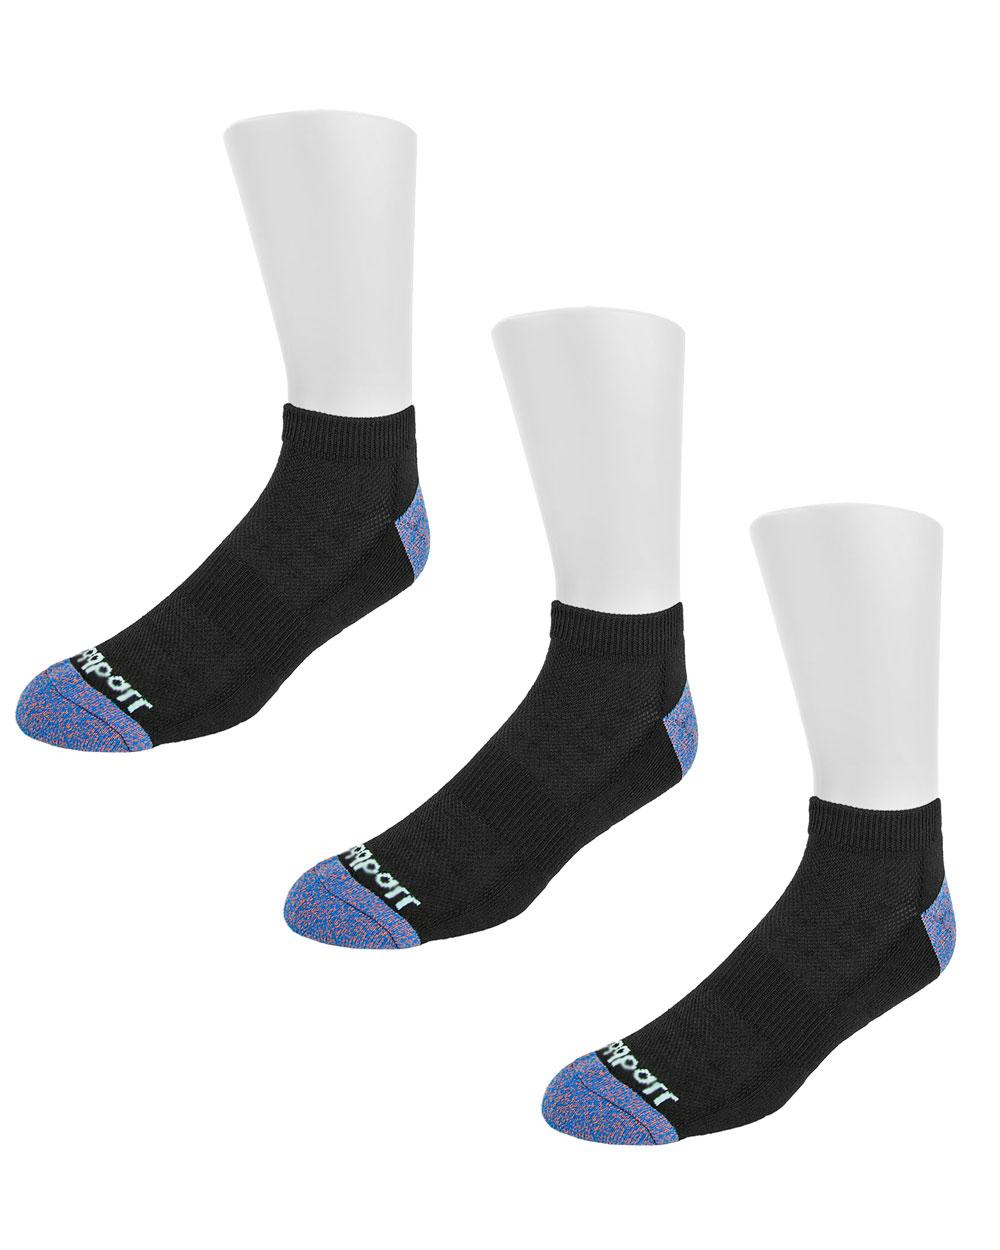 Oddball Performance No Show Socks 3 Pack (black)